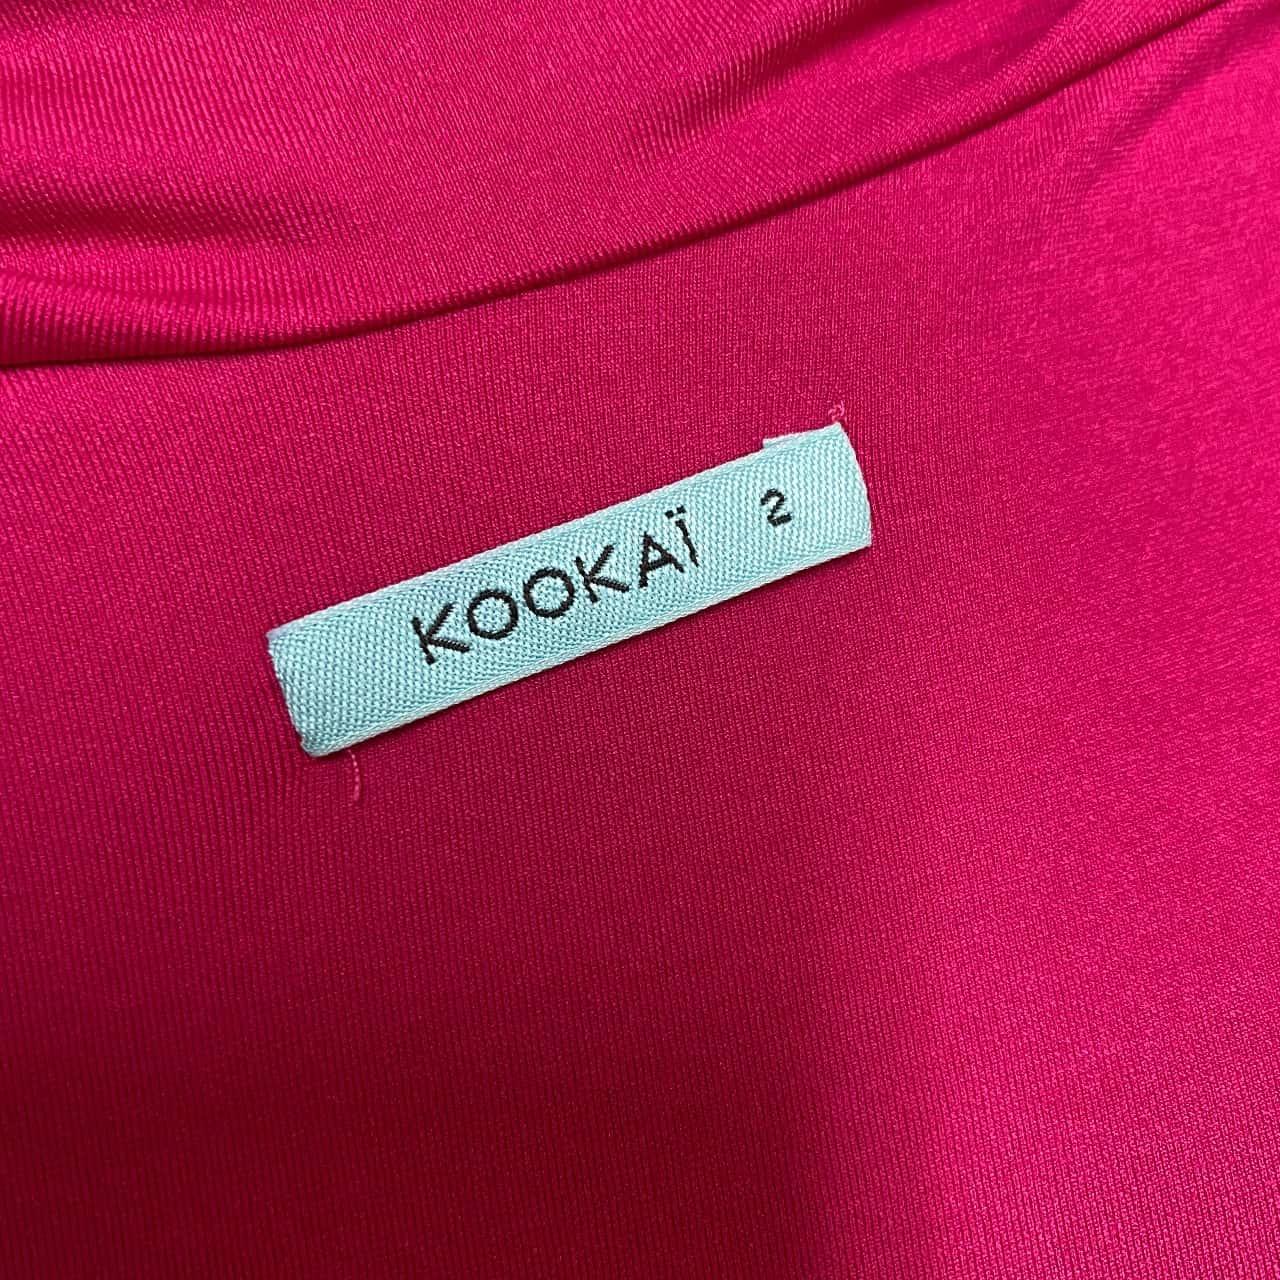 Kookai Womens  Size 2 Party Dress Pink